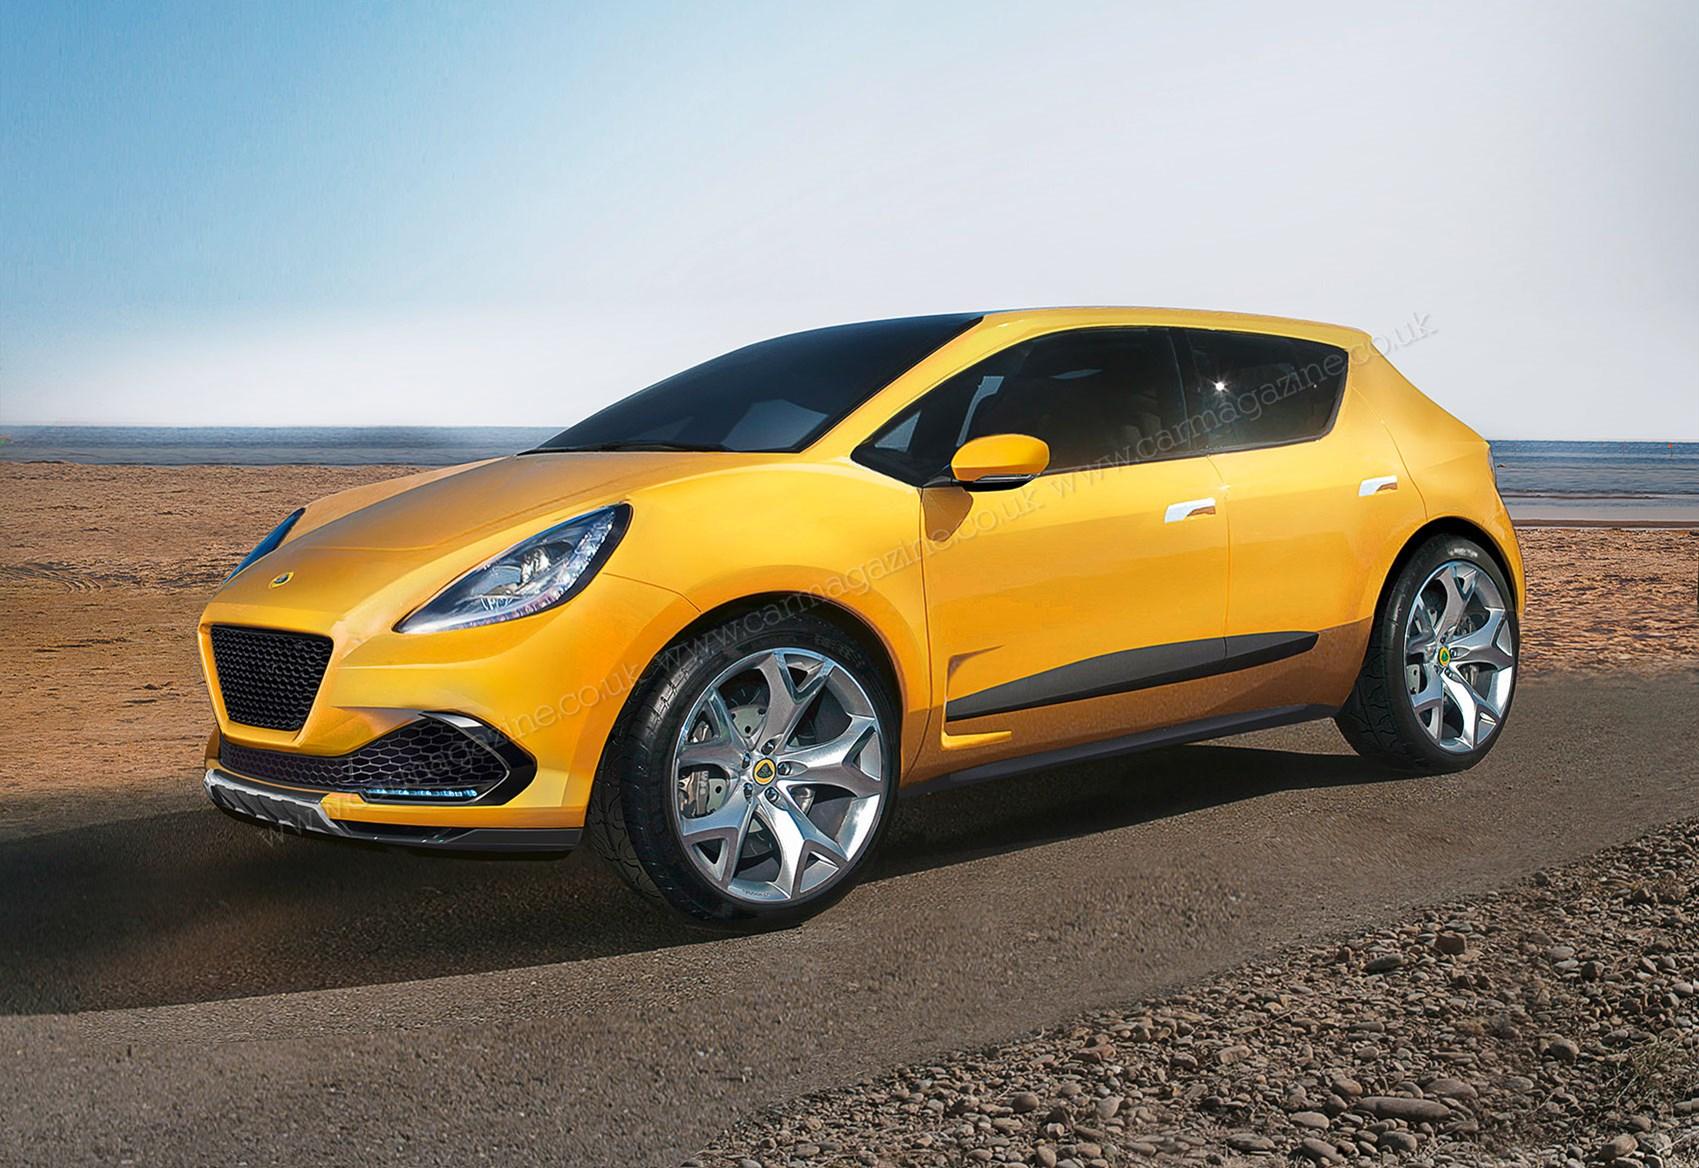 Lotus SUV revealed: Hethel plans lightweight 4x4 for 2020 ...